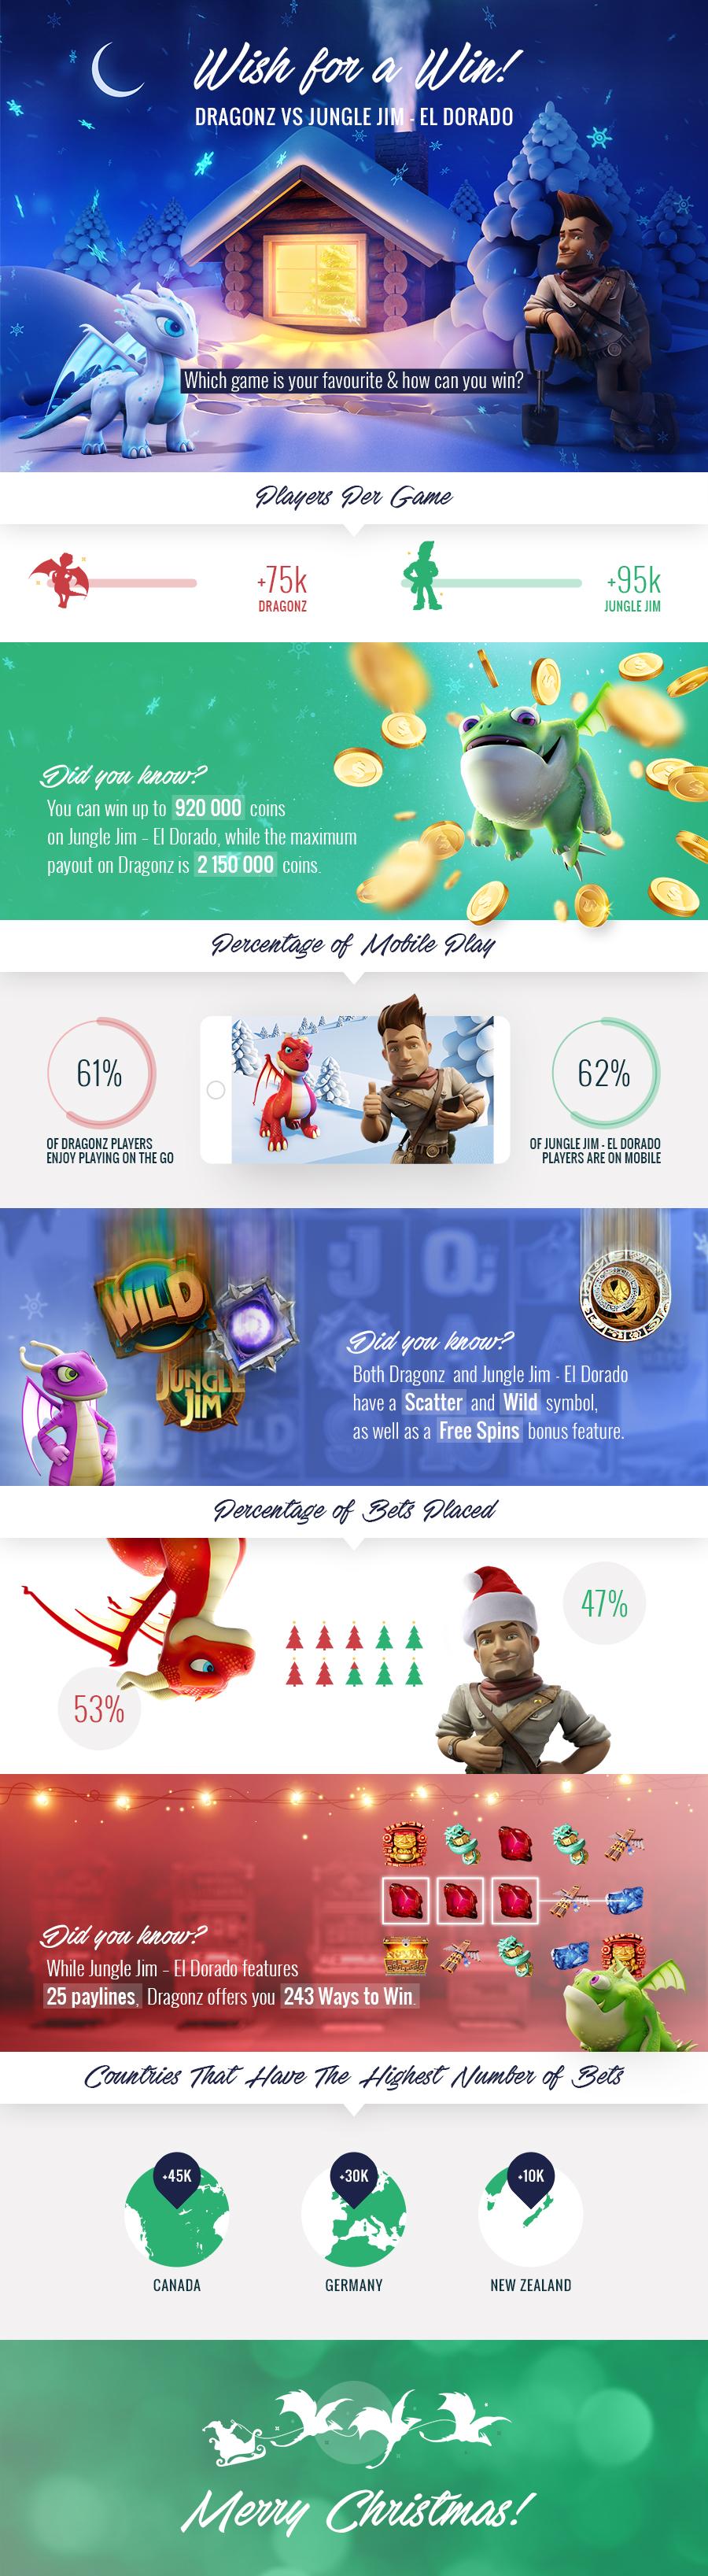 Dragonz vs Jungle Jim infographic